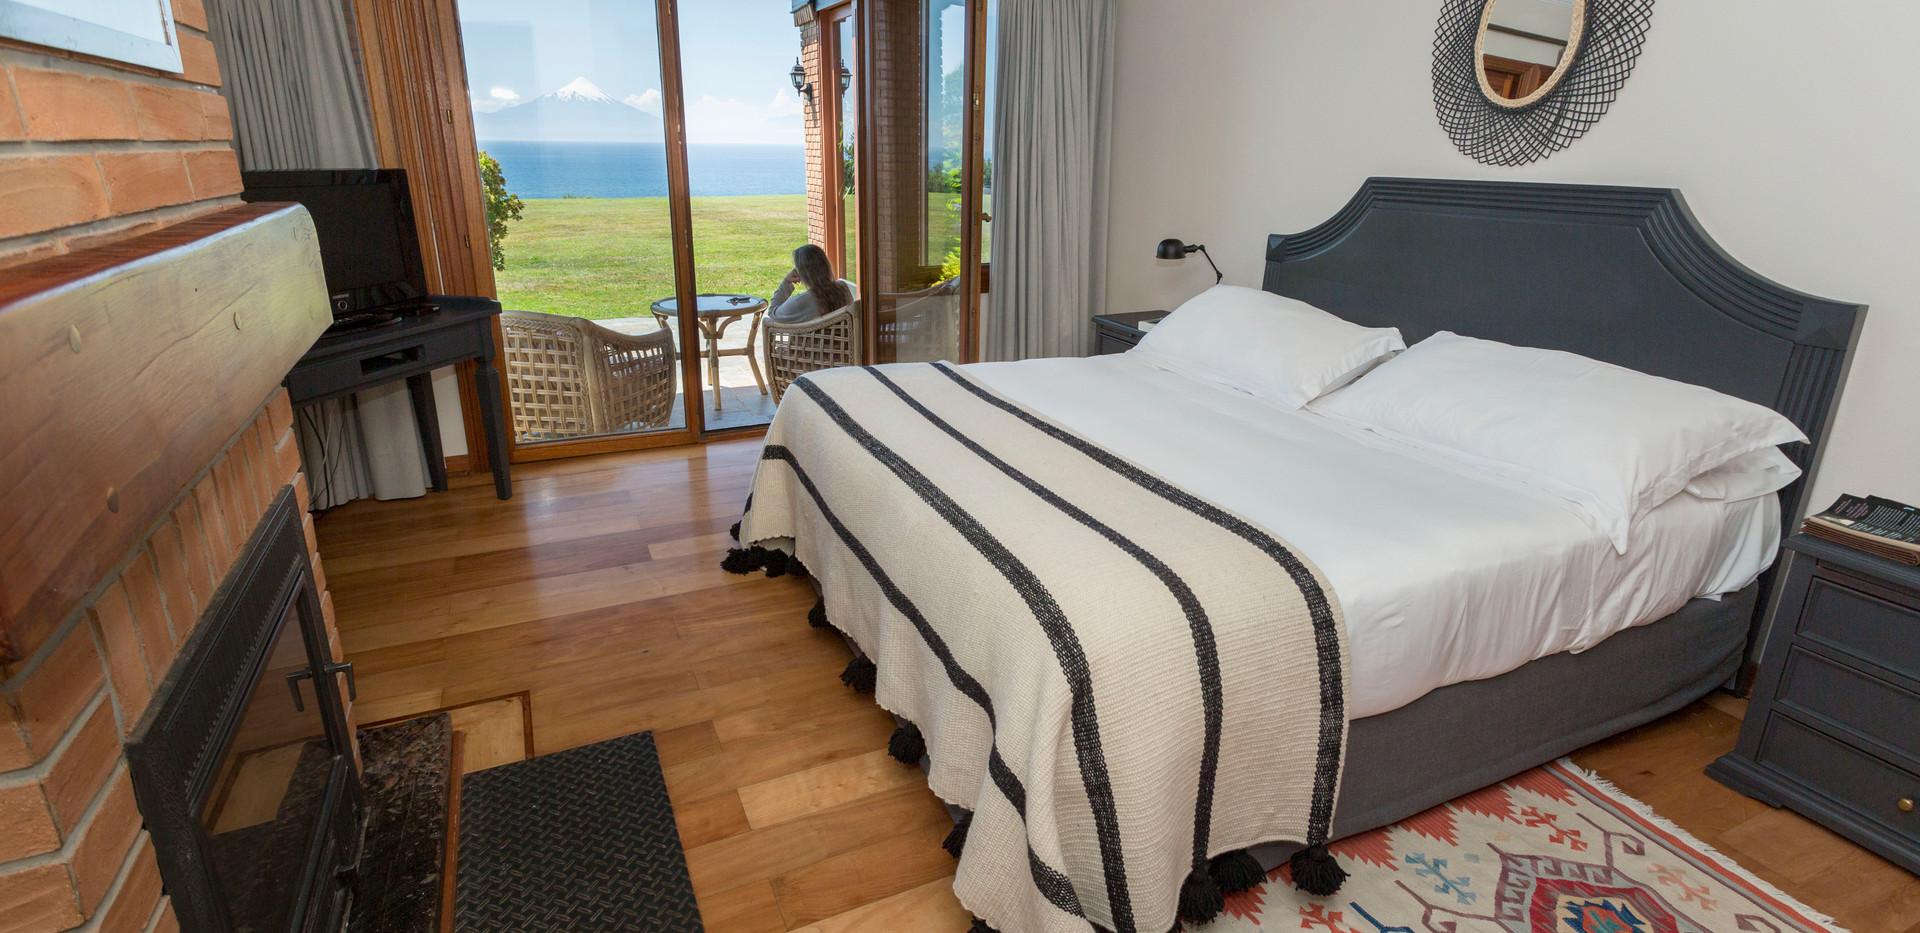 Hotel_Casa_Molino-IMG_6059.jpg